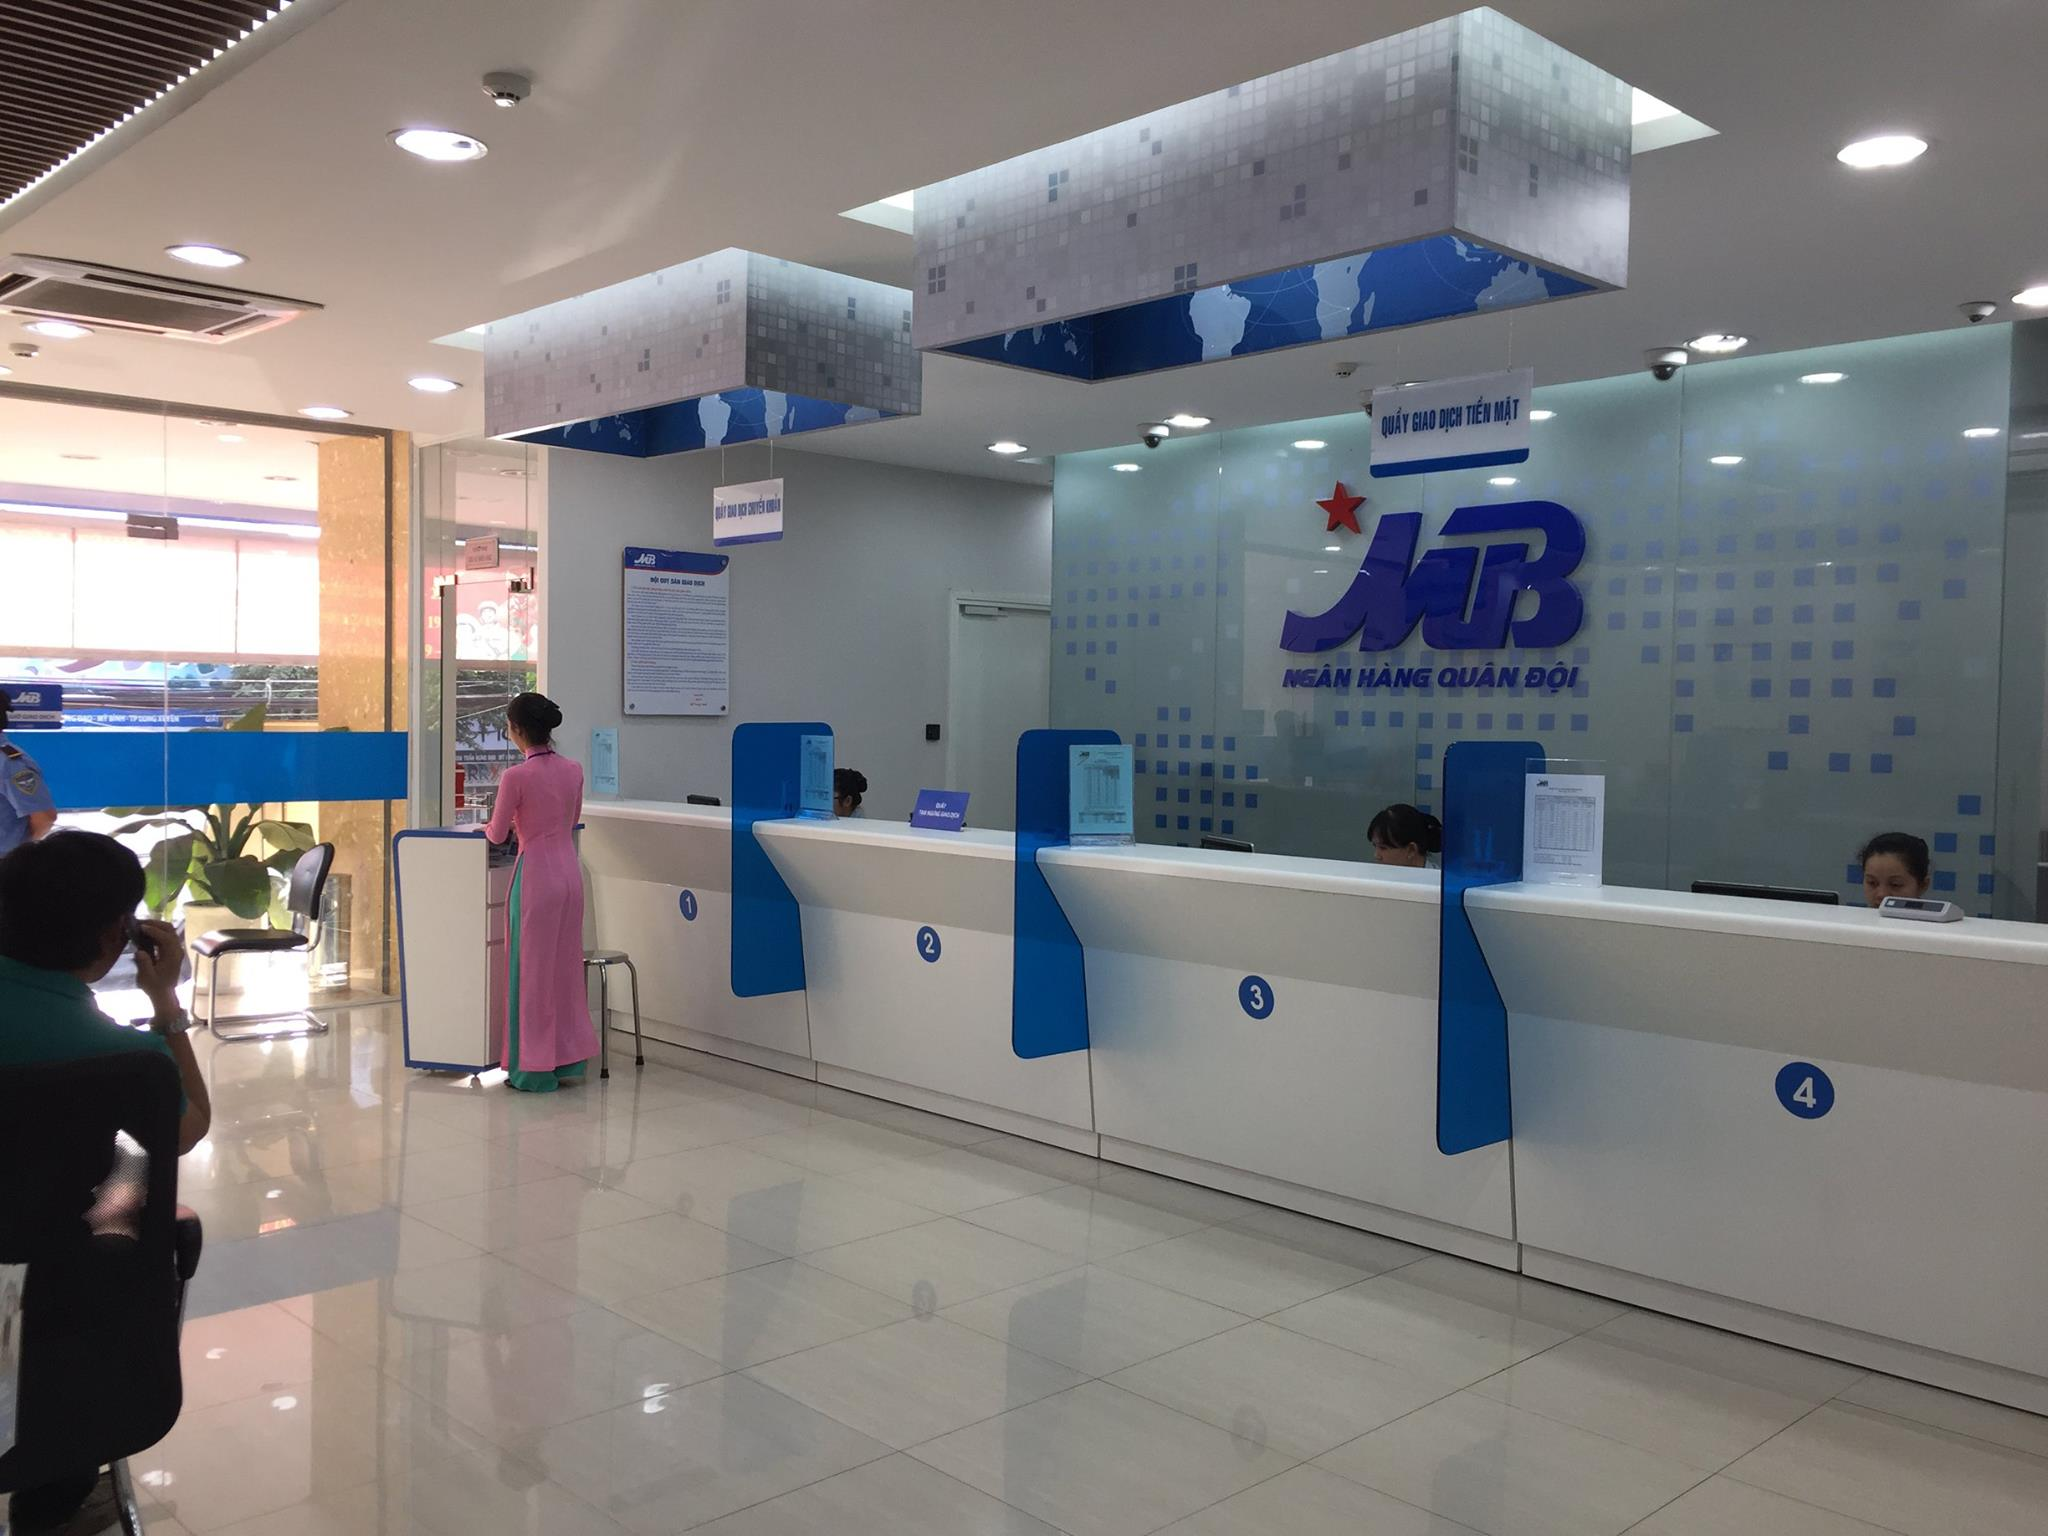 Interior lighting construction of MB Bank